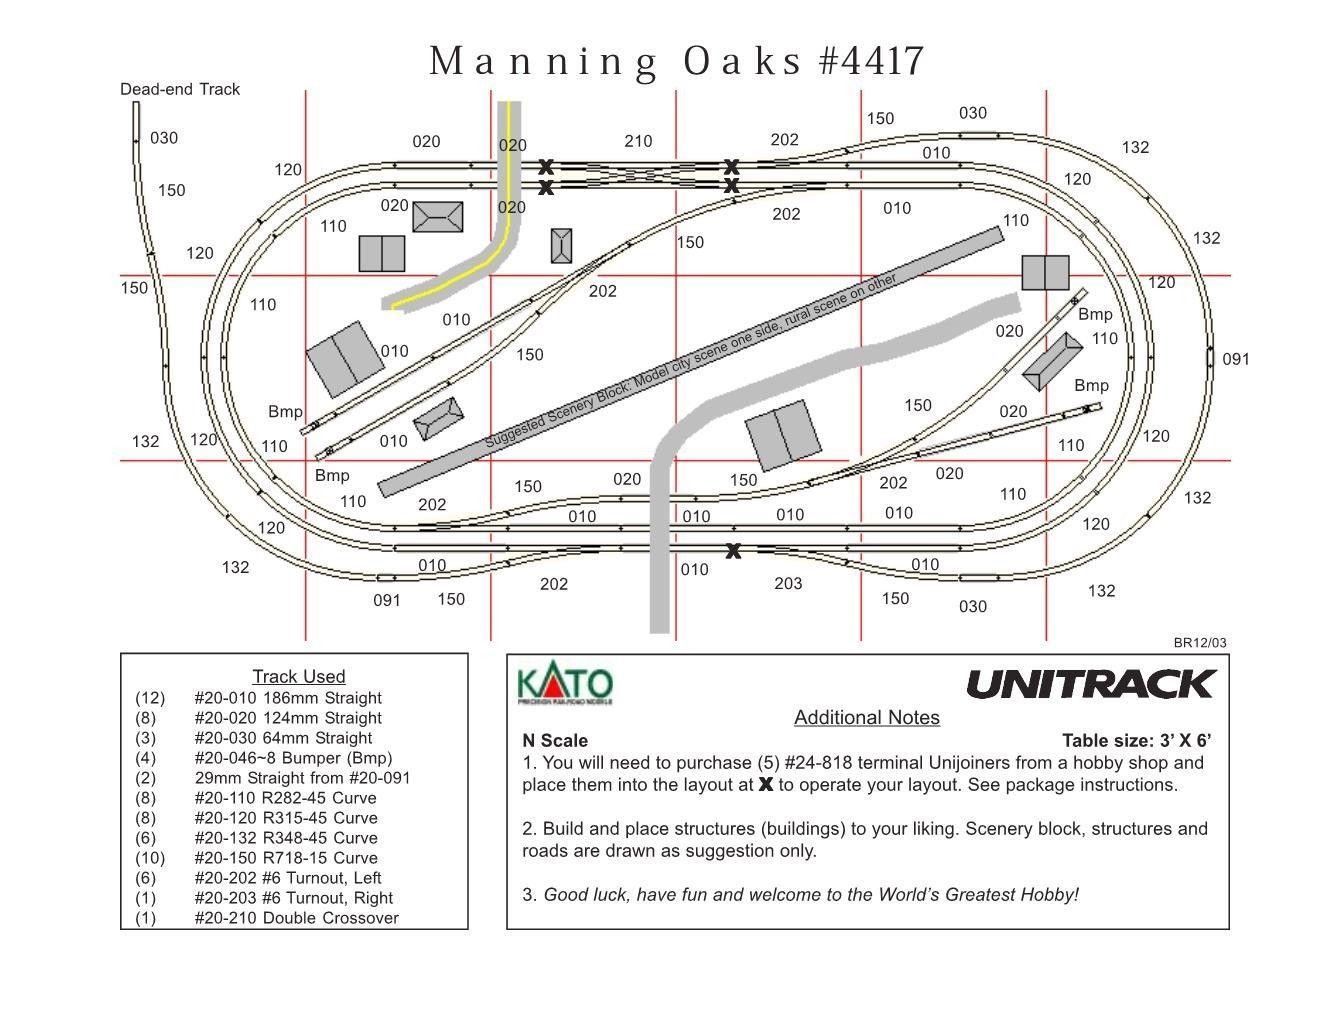 Kato N Scale Manning Oaks Unitrack Track Layout Train